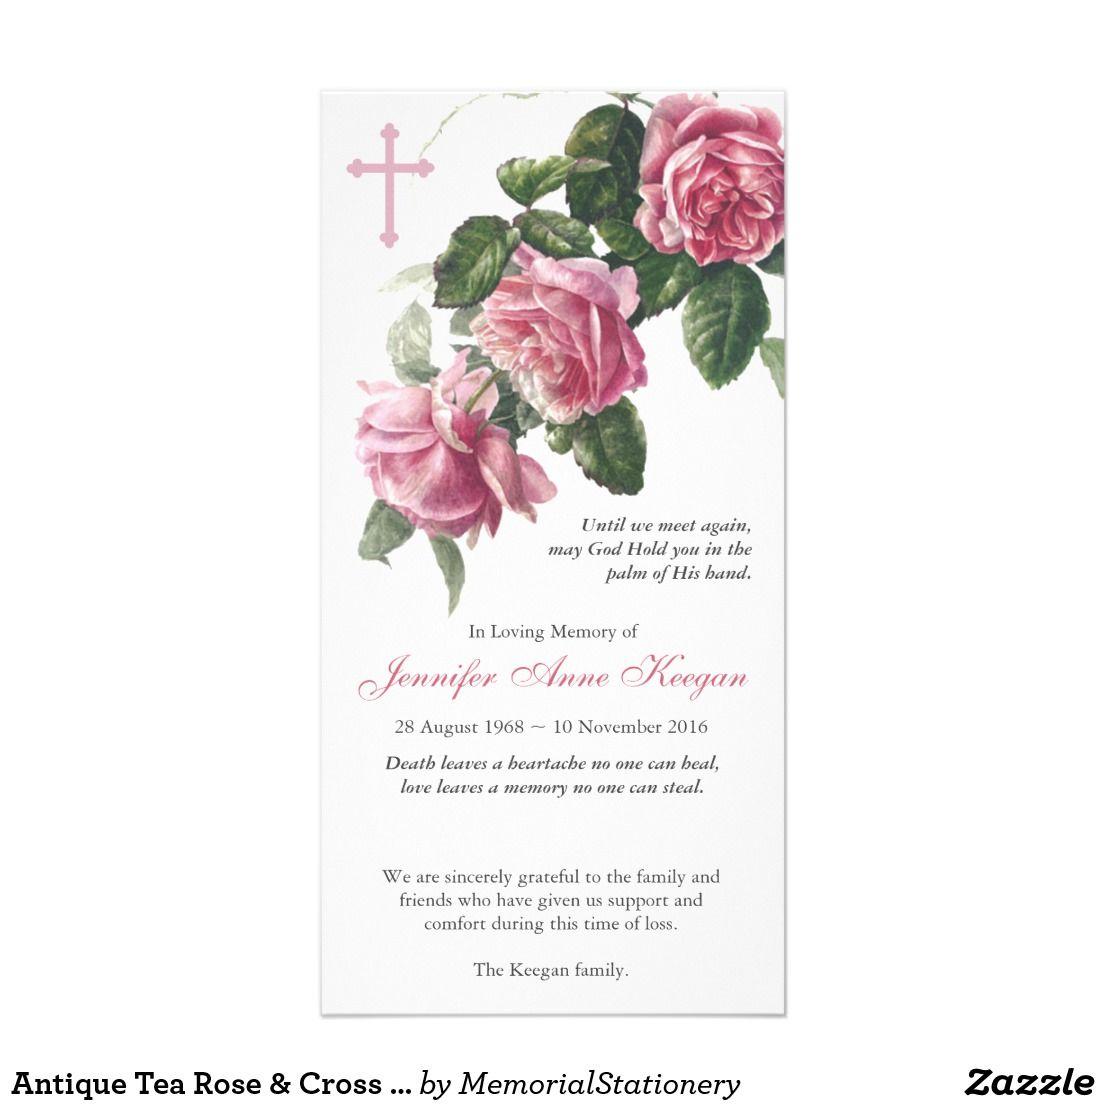 e7c081083 Antique Tea Rose & Cross Funeral Thank You | Zazzle.com.au | Funeral ...